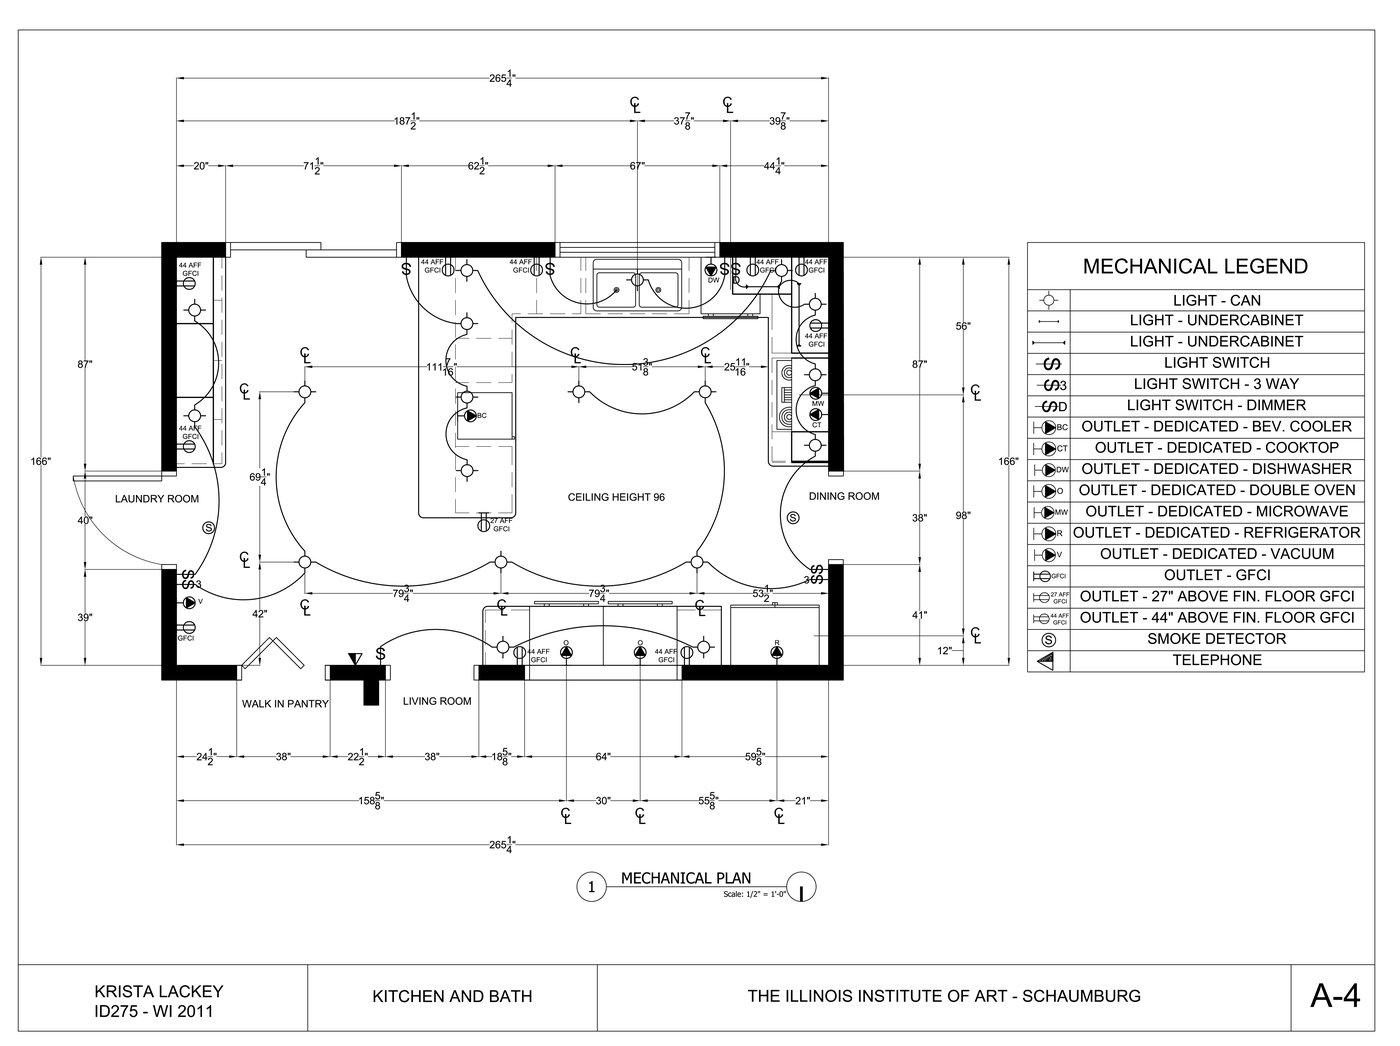 Kitchen and Bath Design by Krista Lackey at Coroflot.com